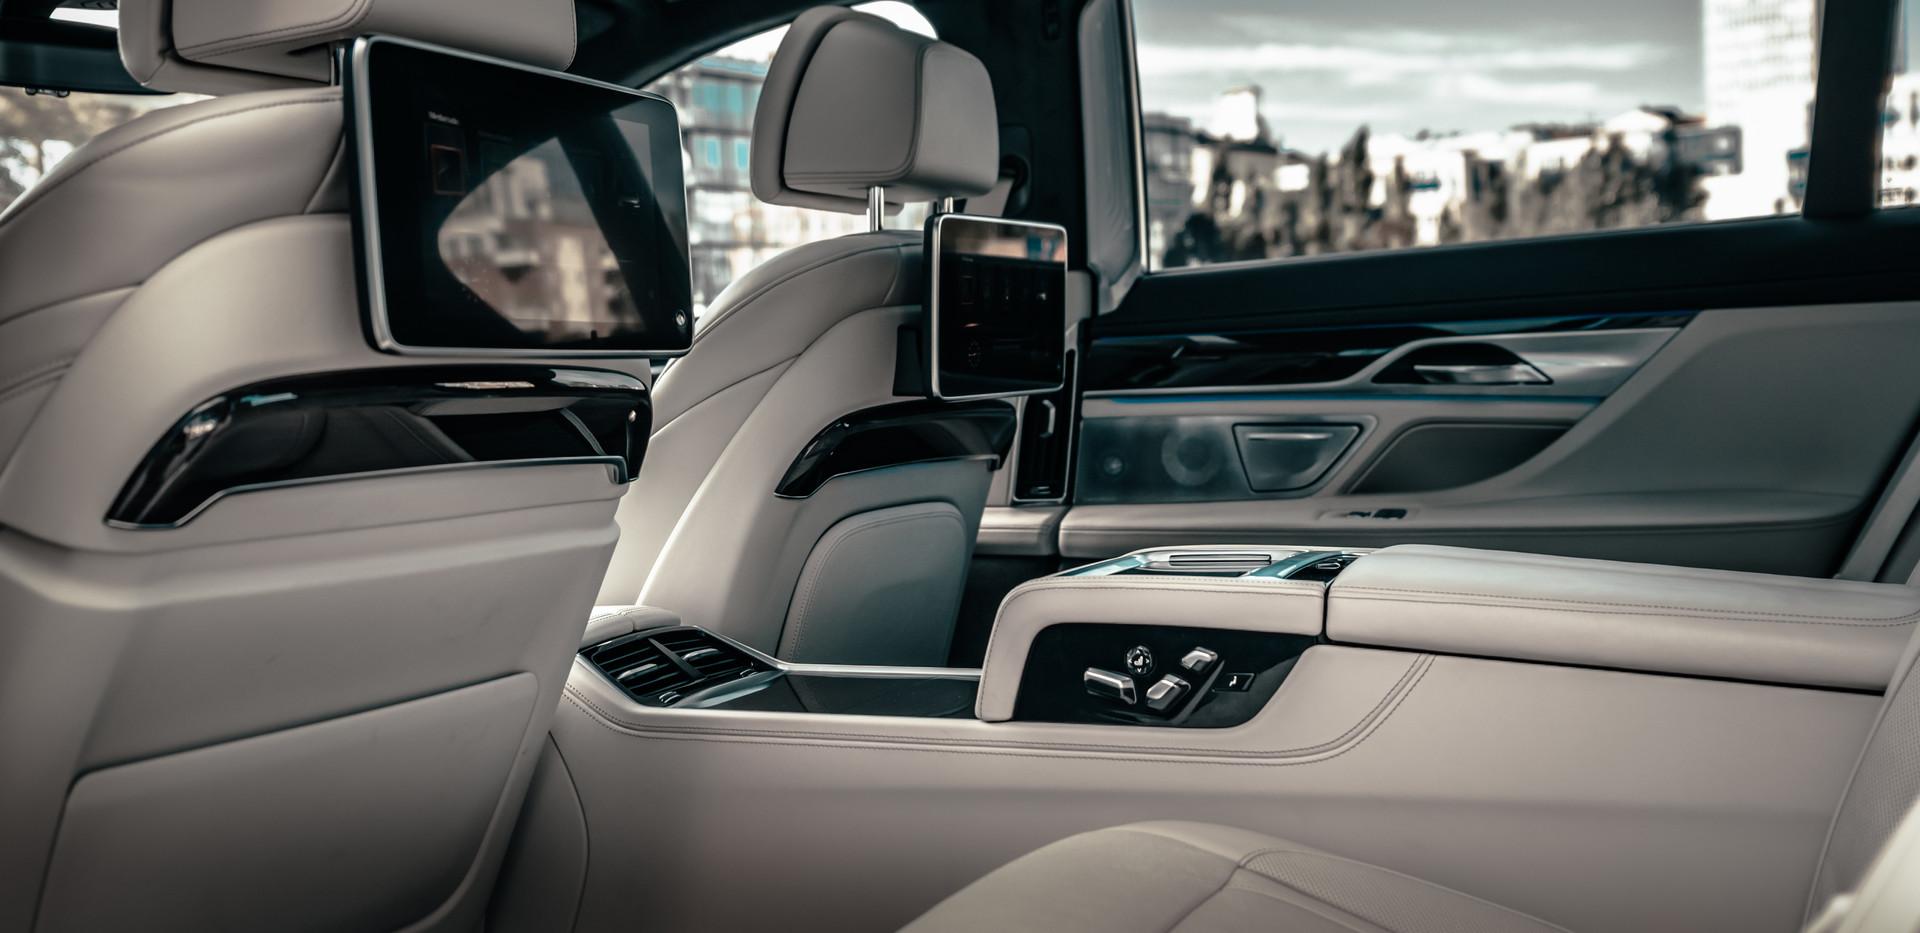 Private Chauffeur Mr Charles BMW 7 Li - Series